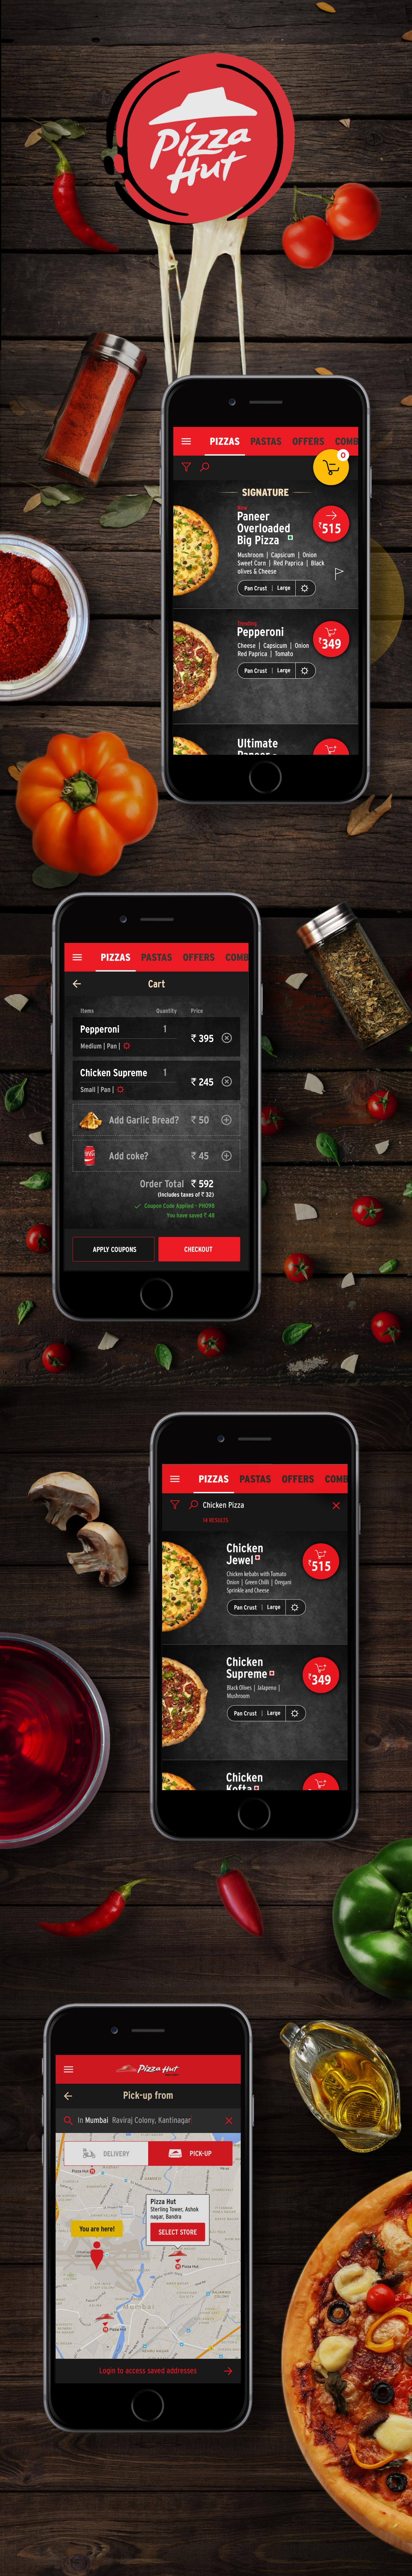 pizzahut uiux Mobile UI Product Mobile Design